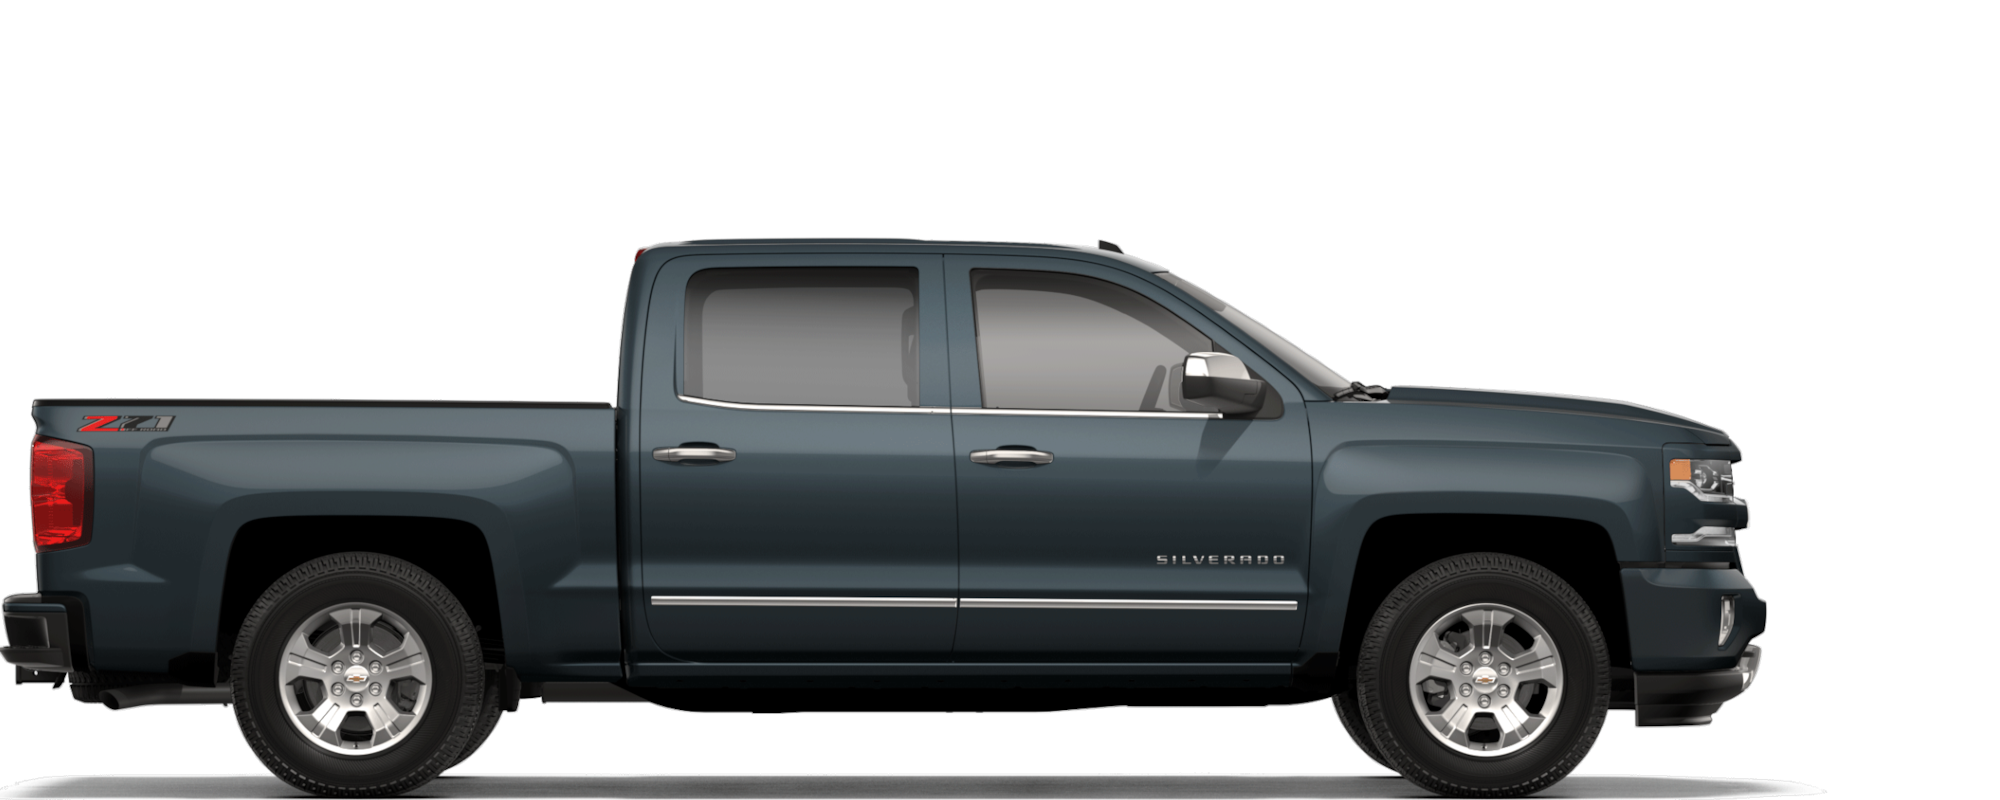 2018 silverado 1500 pickup truck chevrolet rh chevrolet com